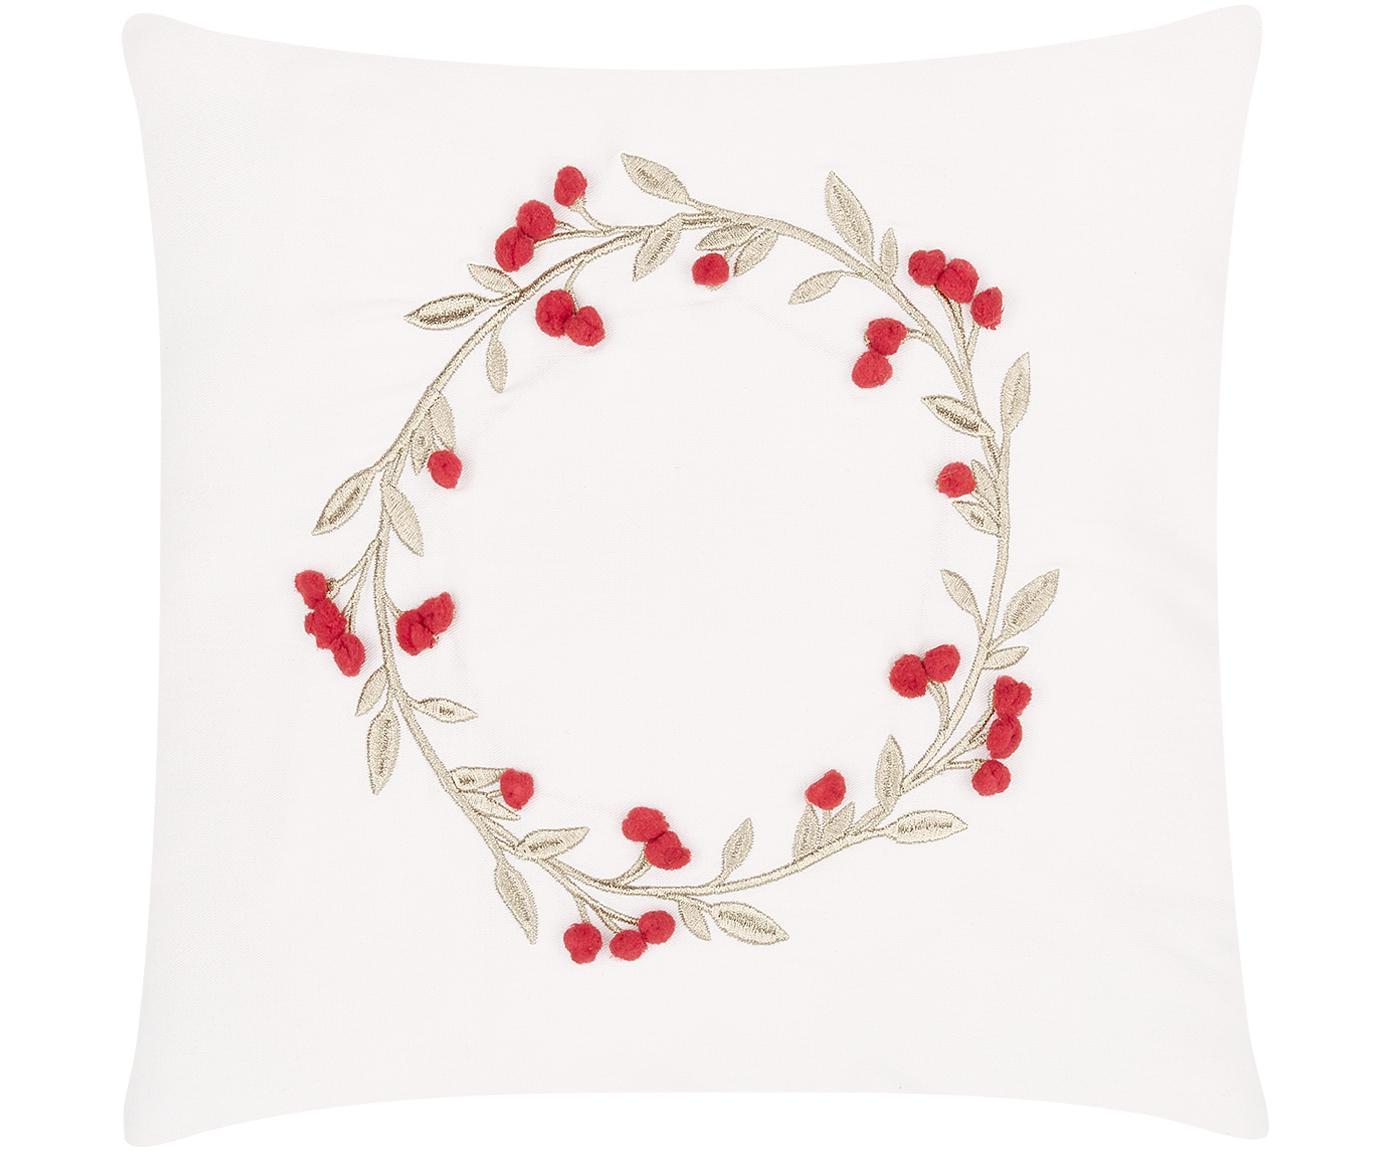 Federa arredo con ghirlanda Christmas Wreath, Bianco crema, Larg. 40 x Lung. 40 cm